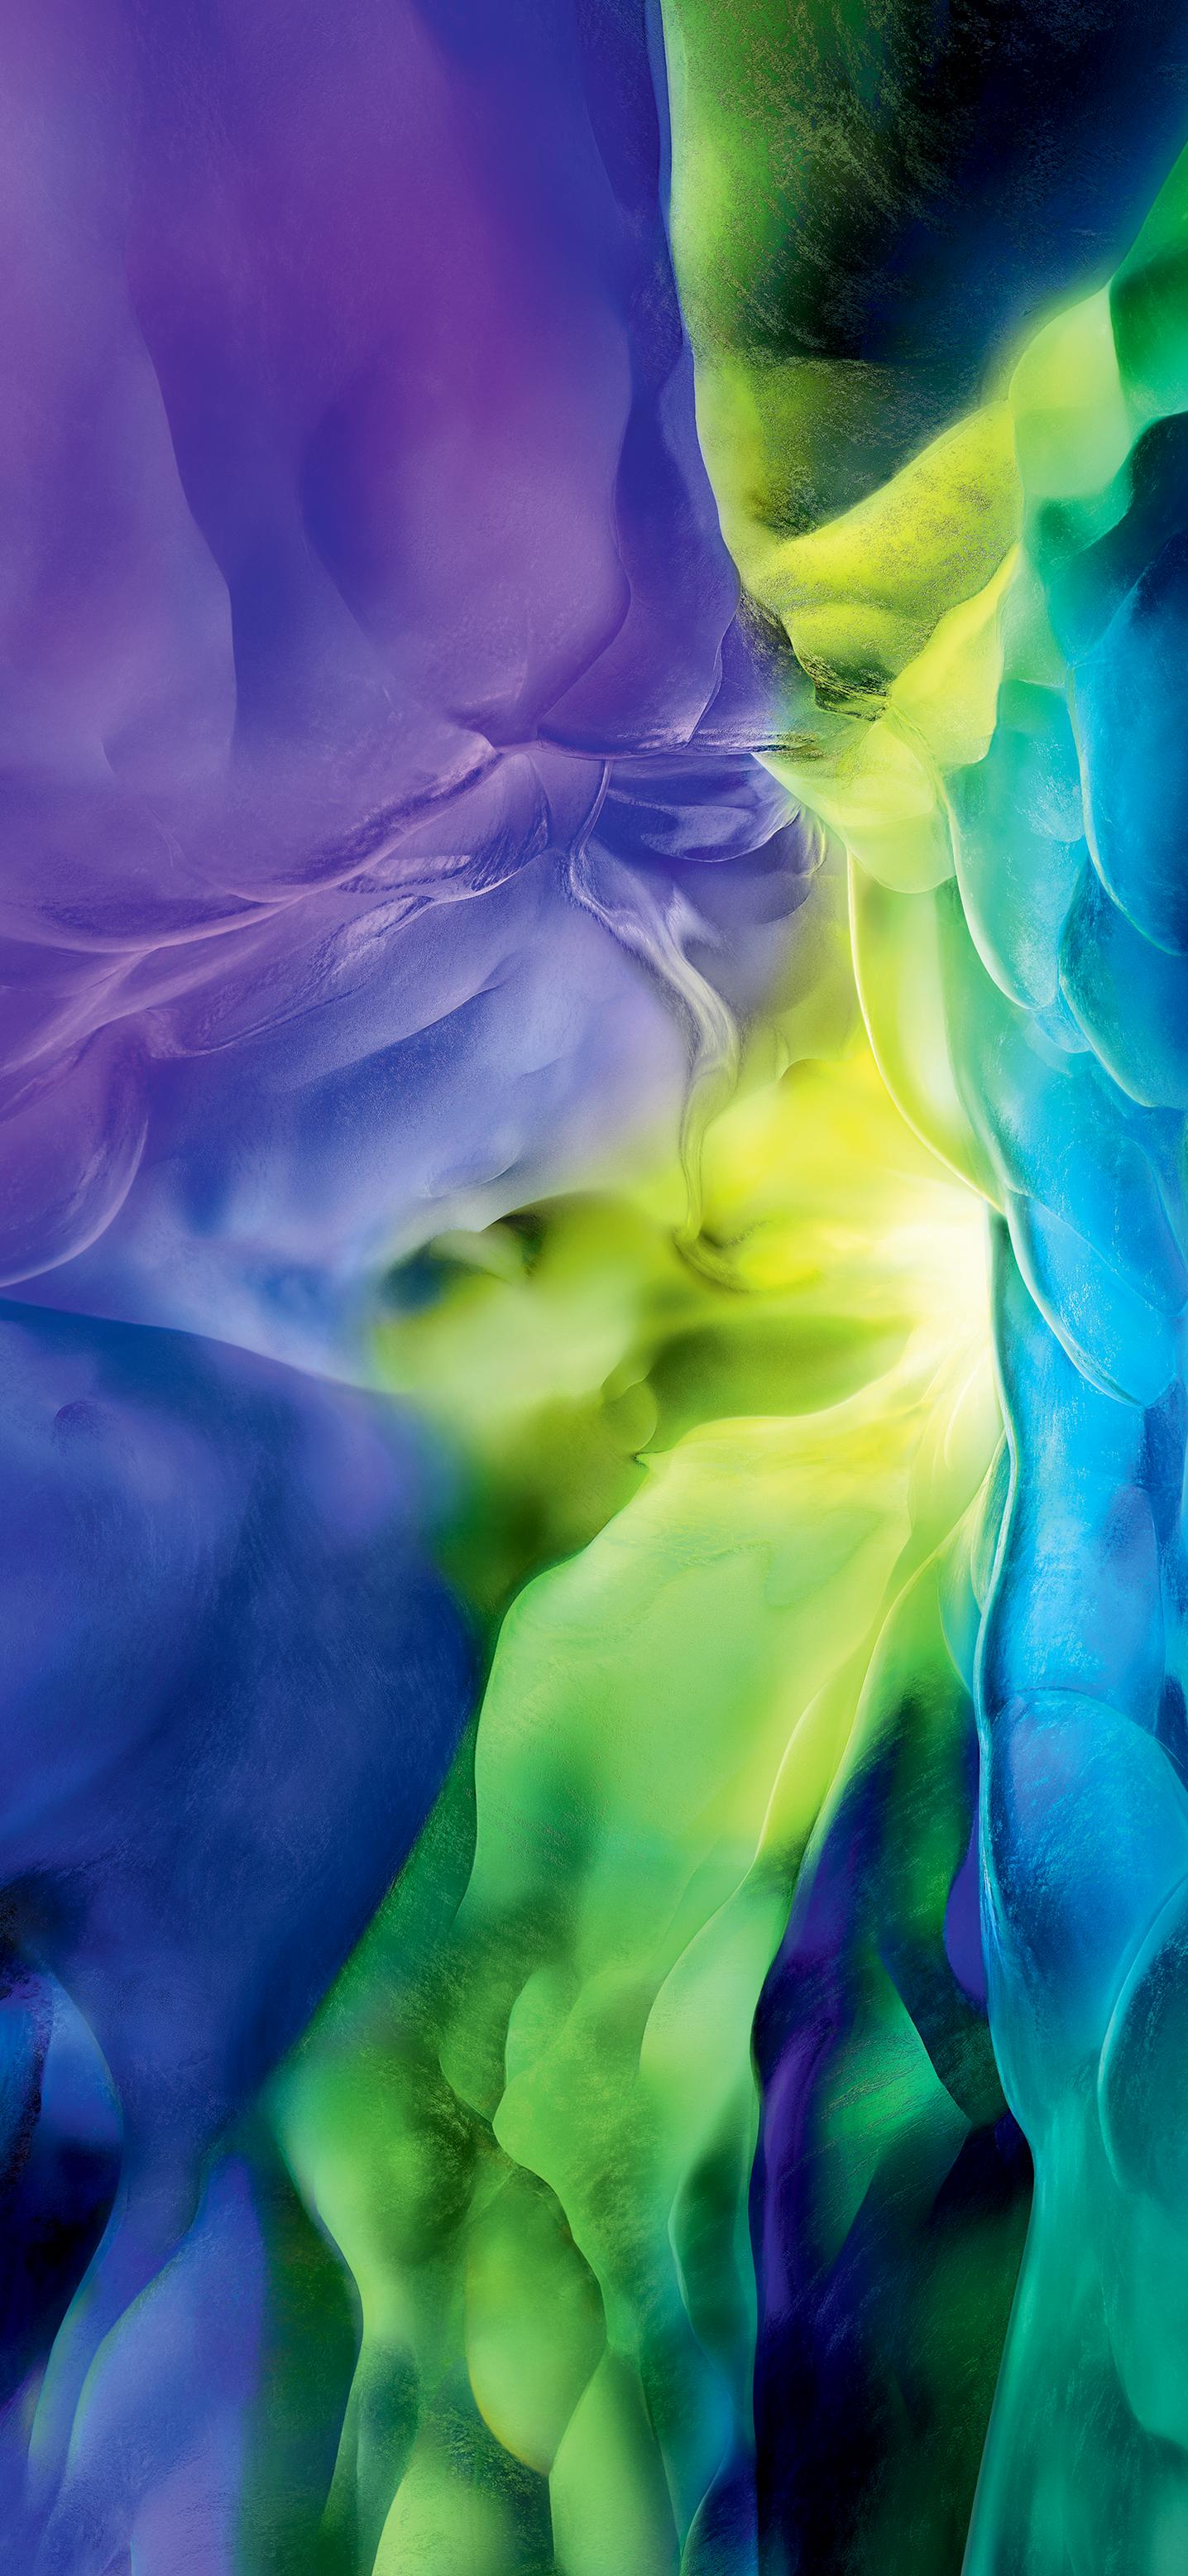 iPad Pro 2020 Wallpapers   Top iPad Pro 2020 Backgrounds 1436x3113